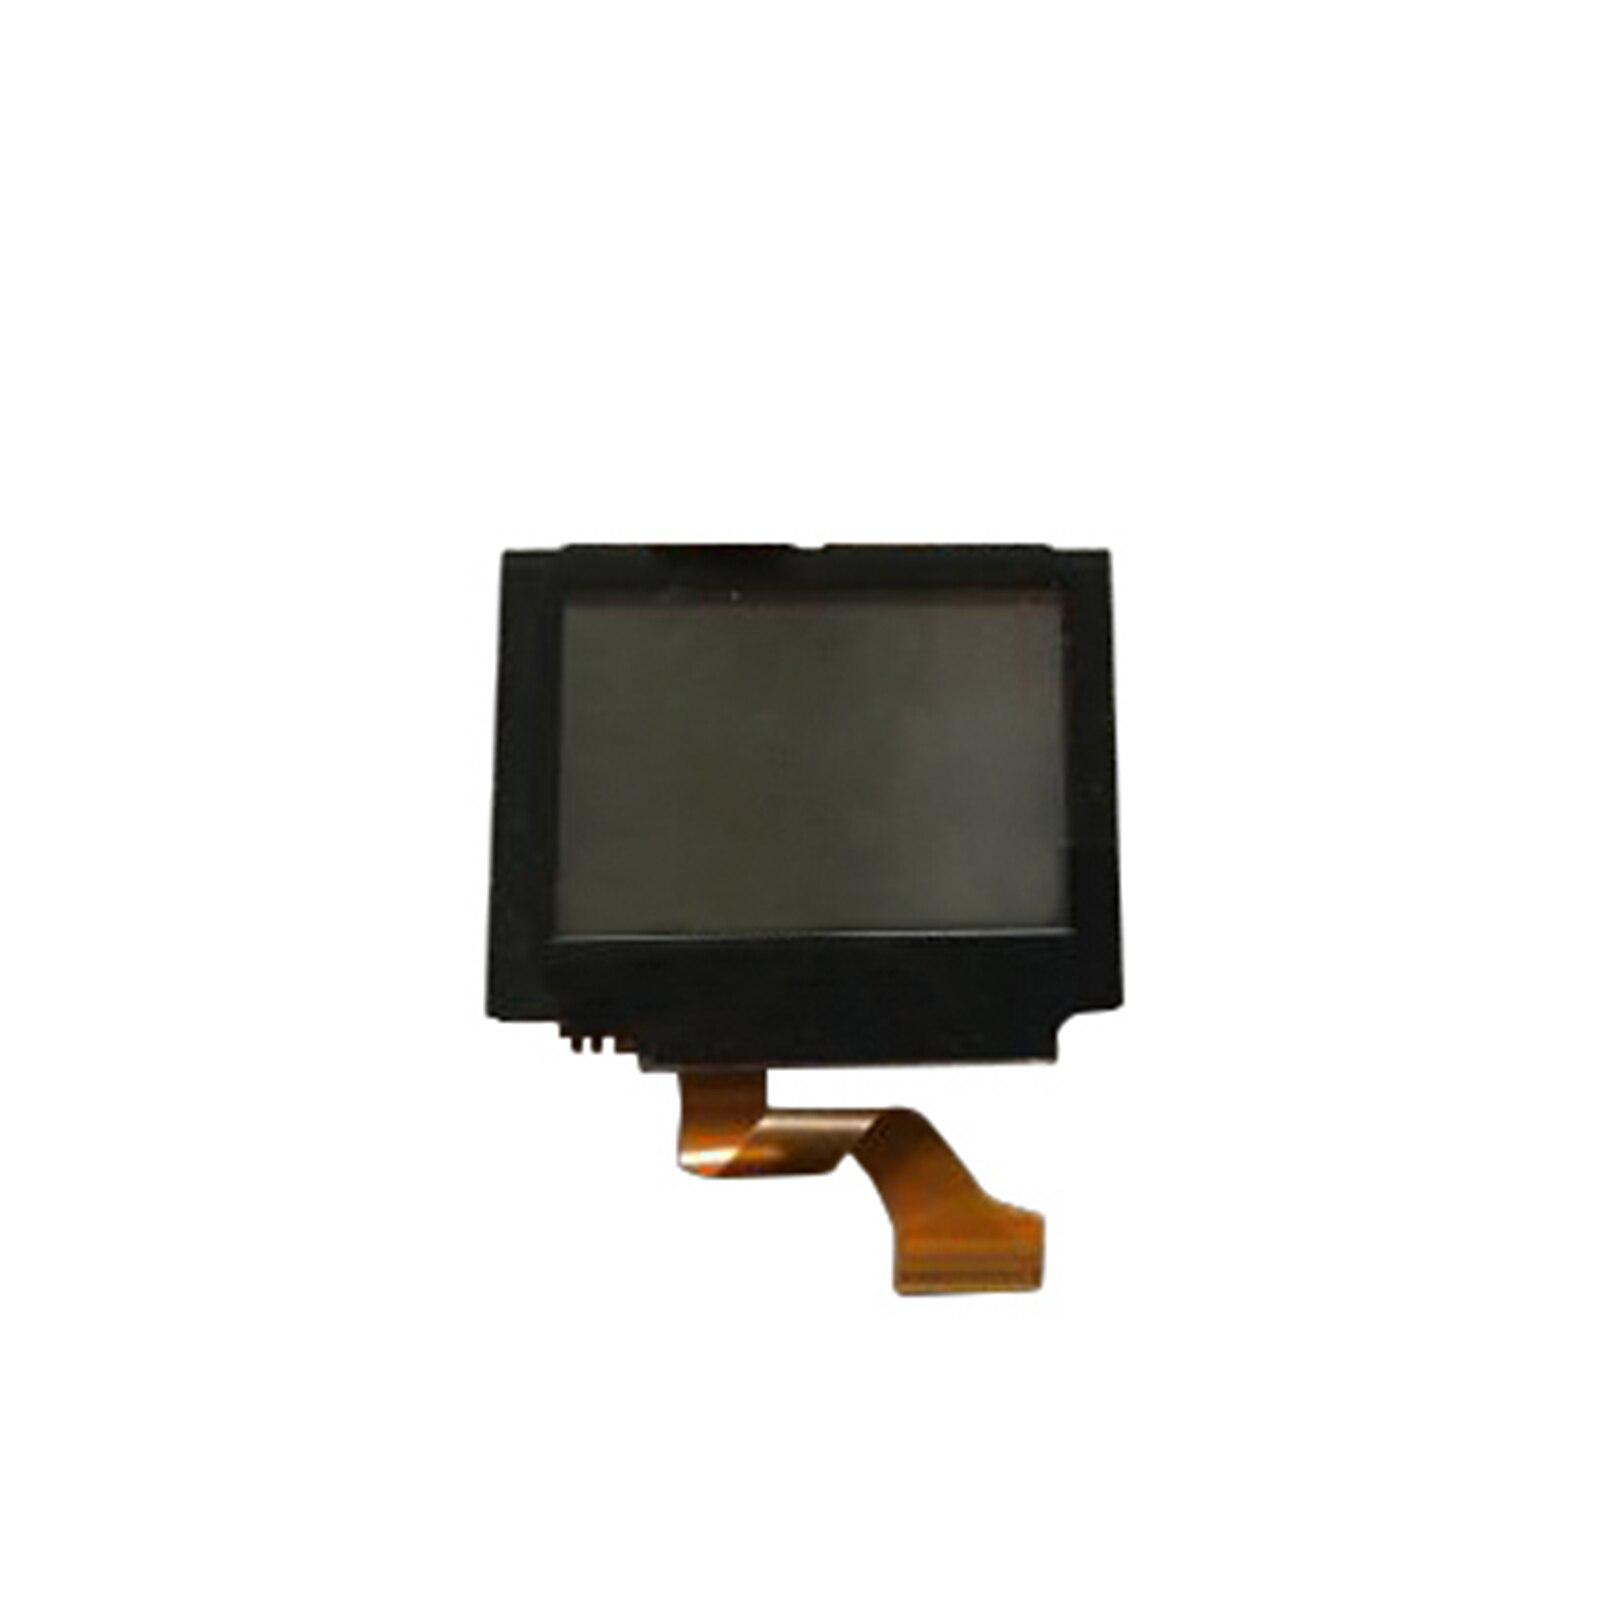 Original Disassemble LCD Screen for Nintend GBA SP AGS 001 LCD Screen for GBA SP AGS